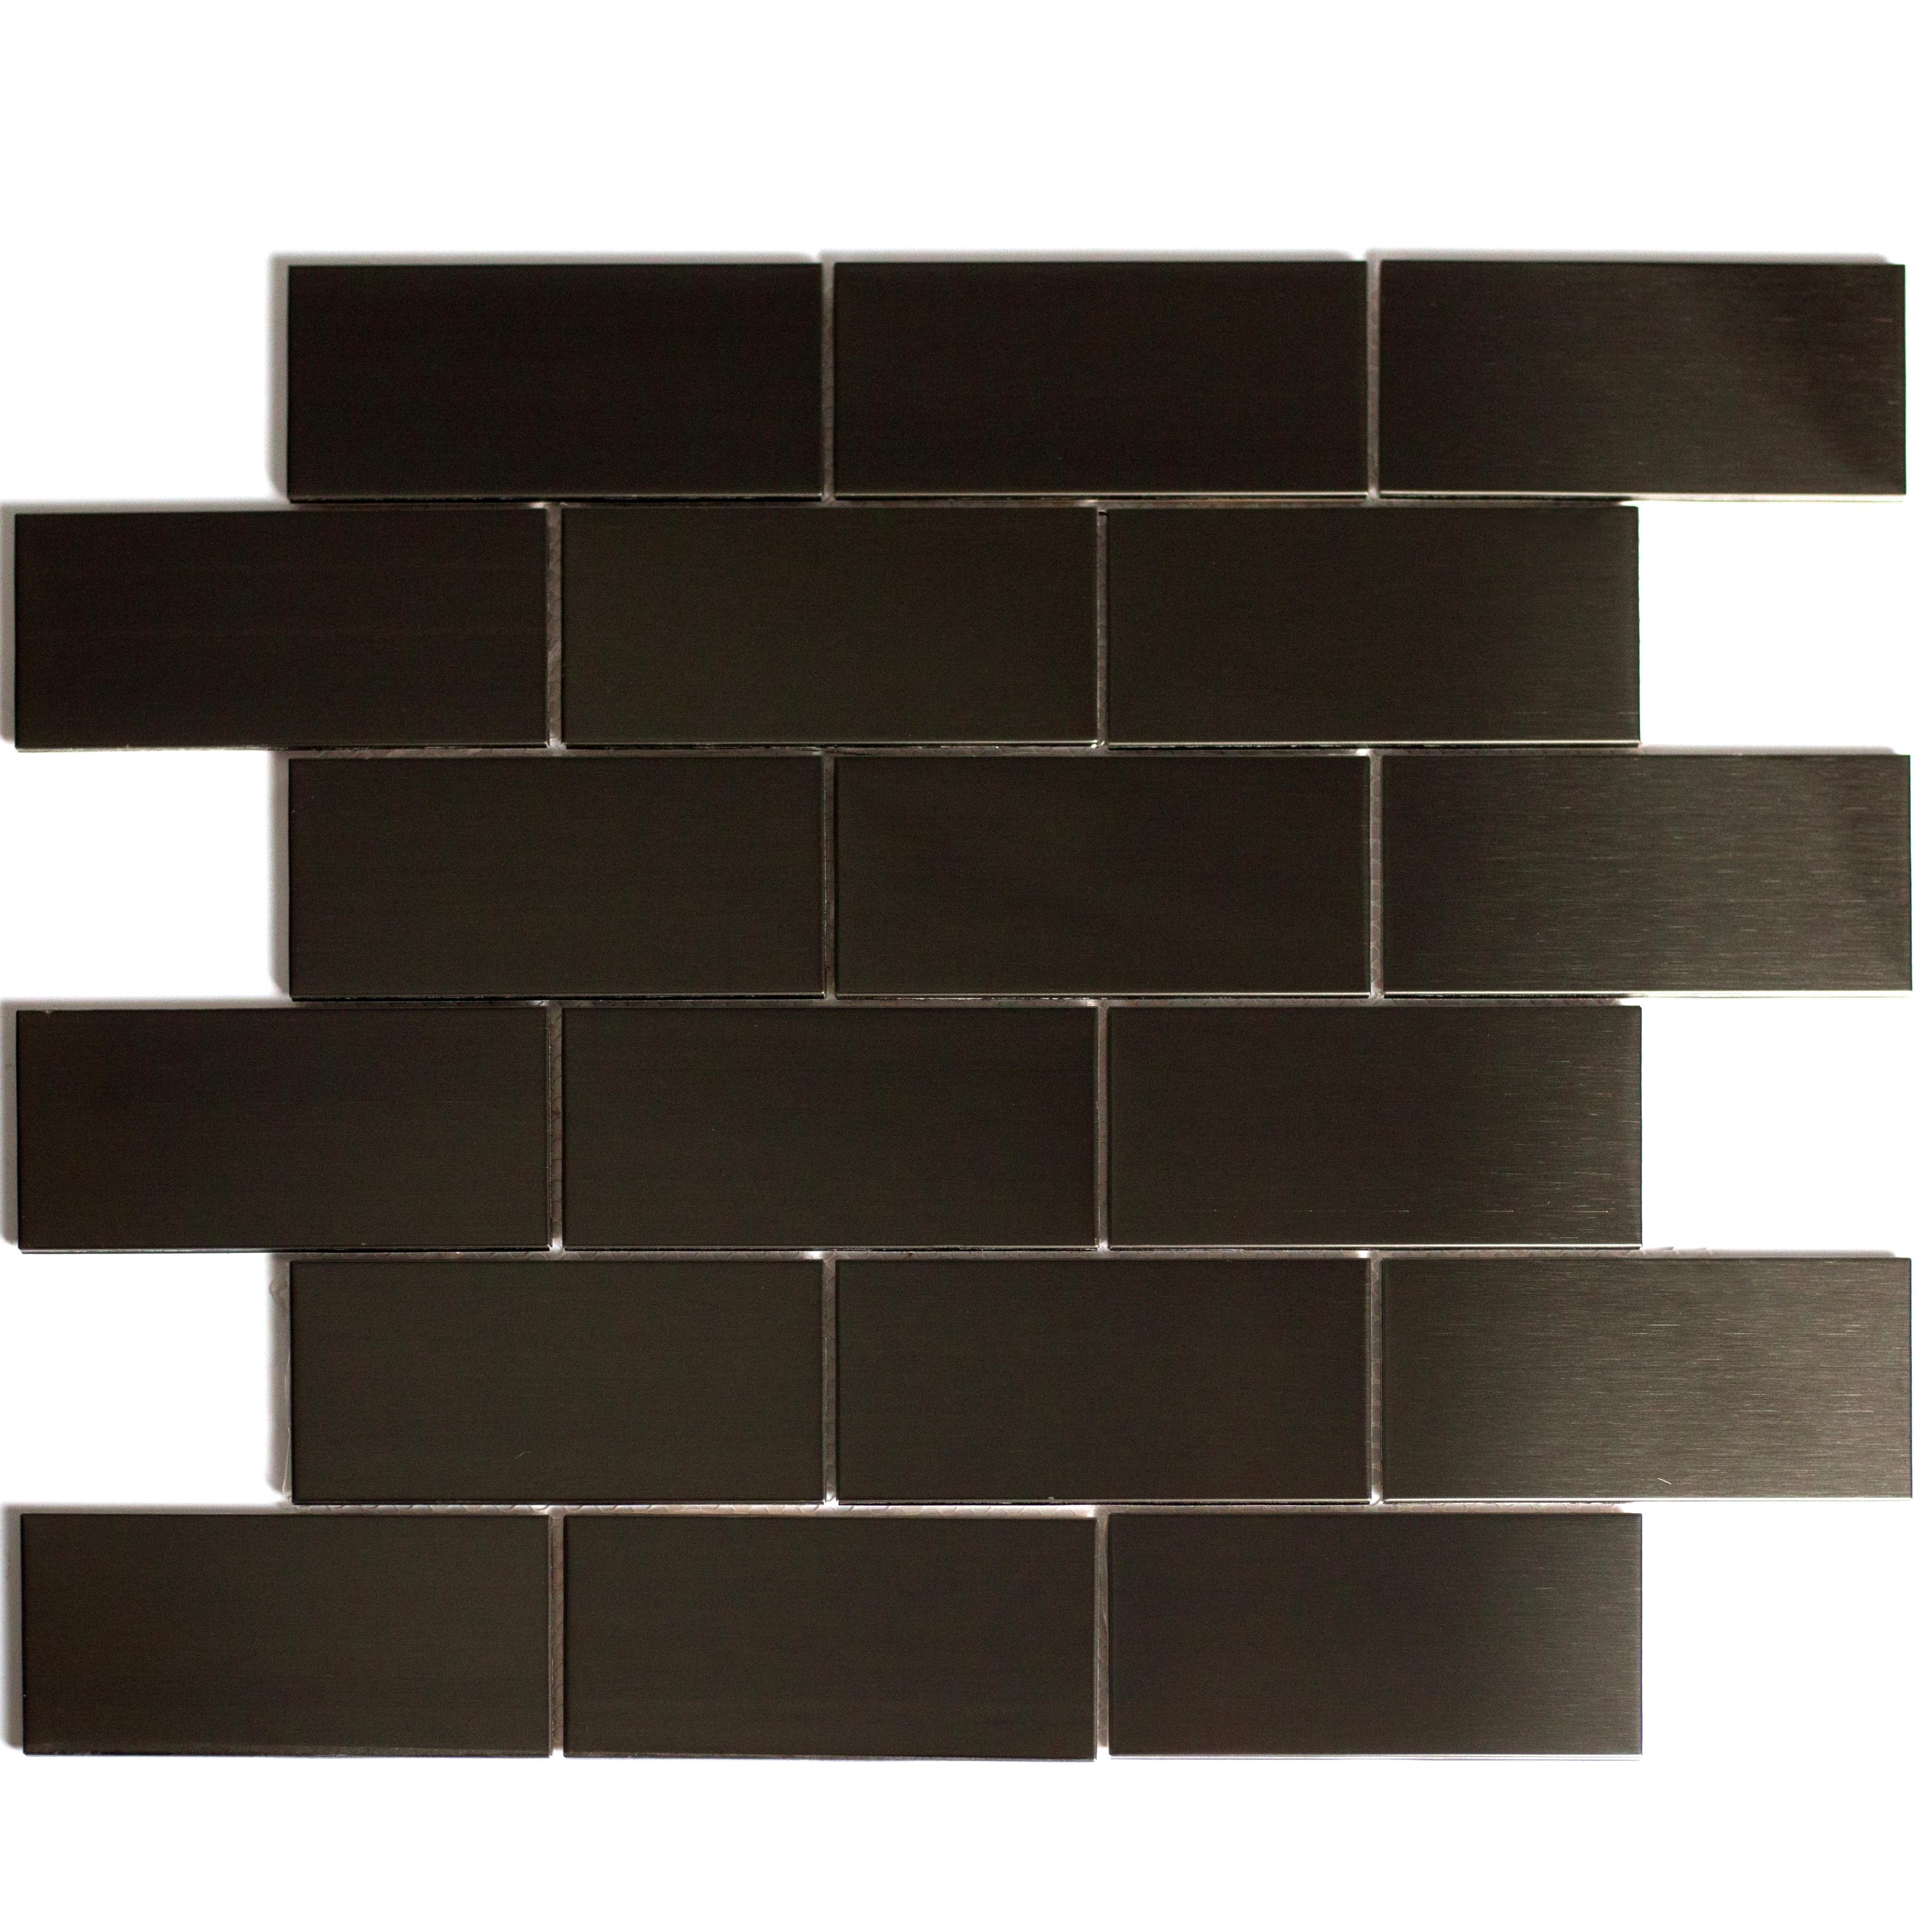 "Enchanted Metals 2"" x 4"" Smooth Bronze Stainless Steel Brick Backsplash Mosaic Wall Tile"